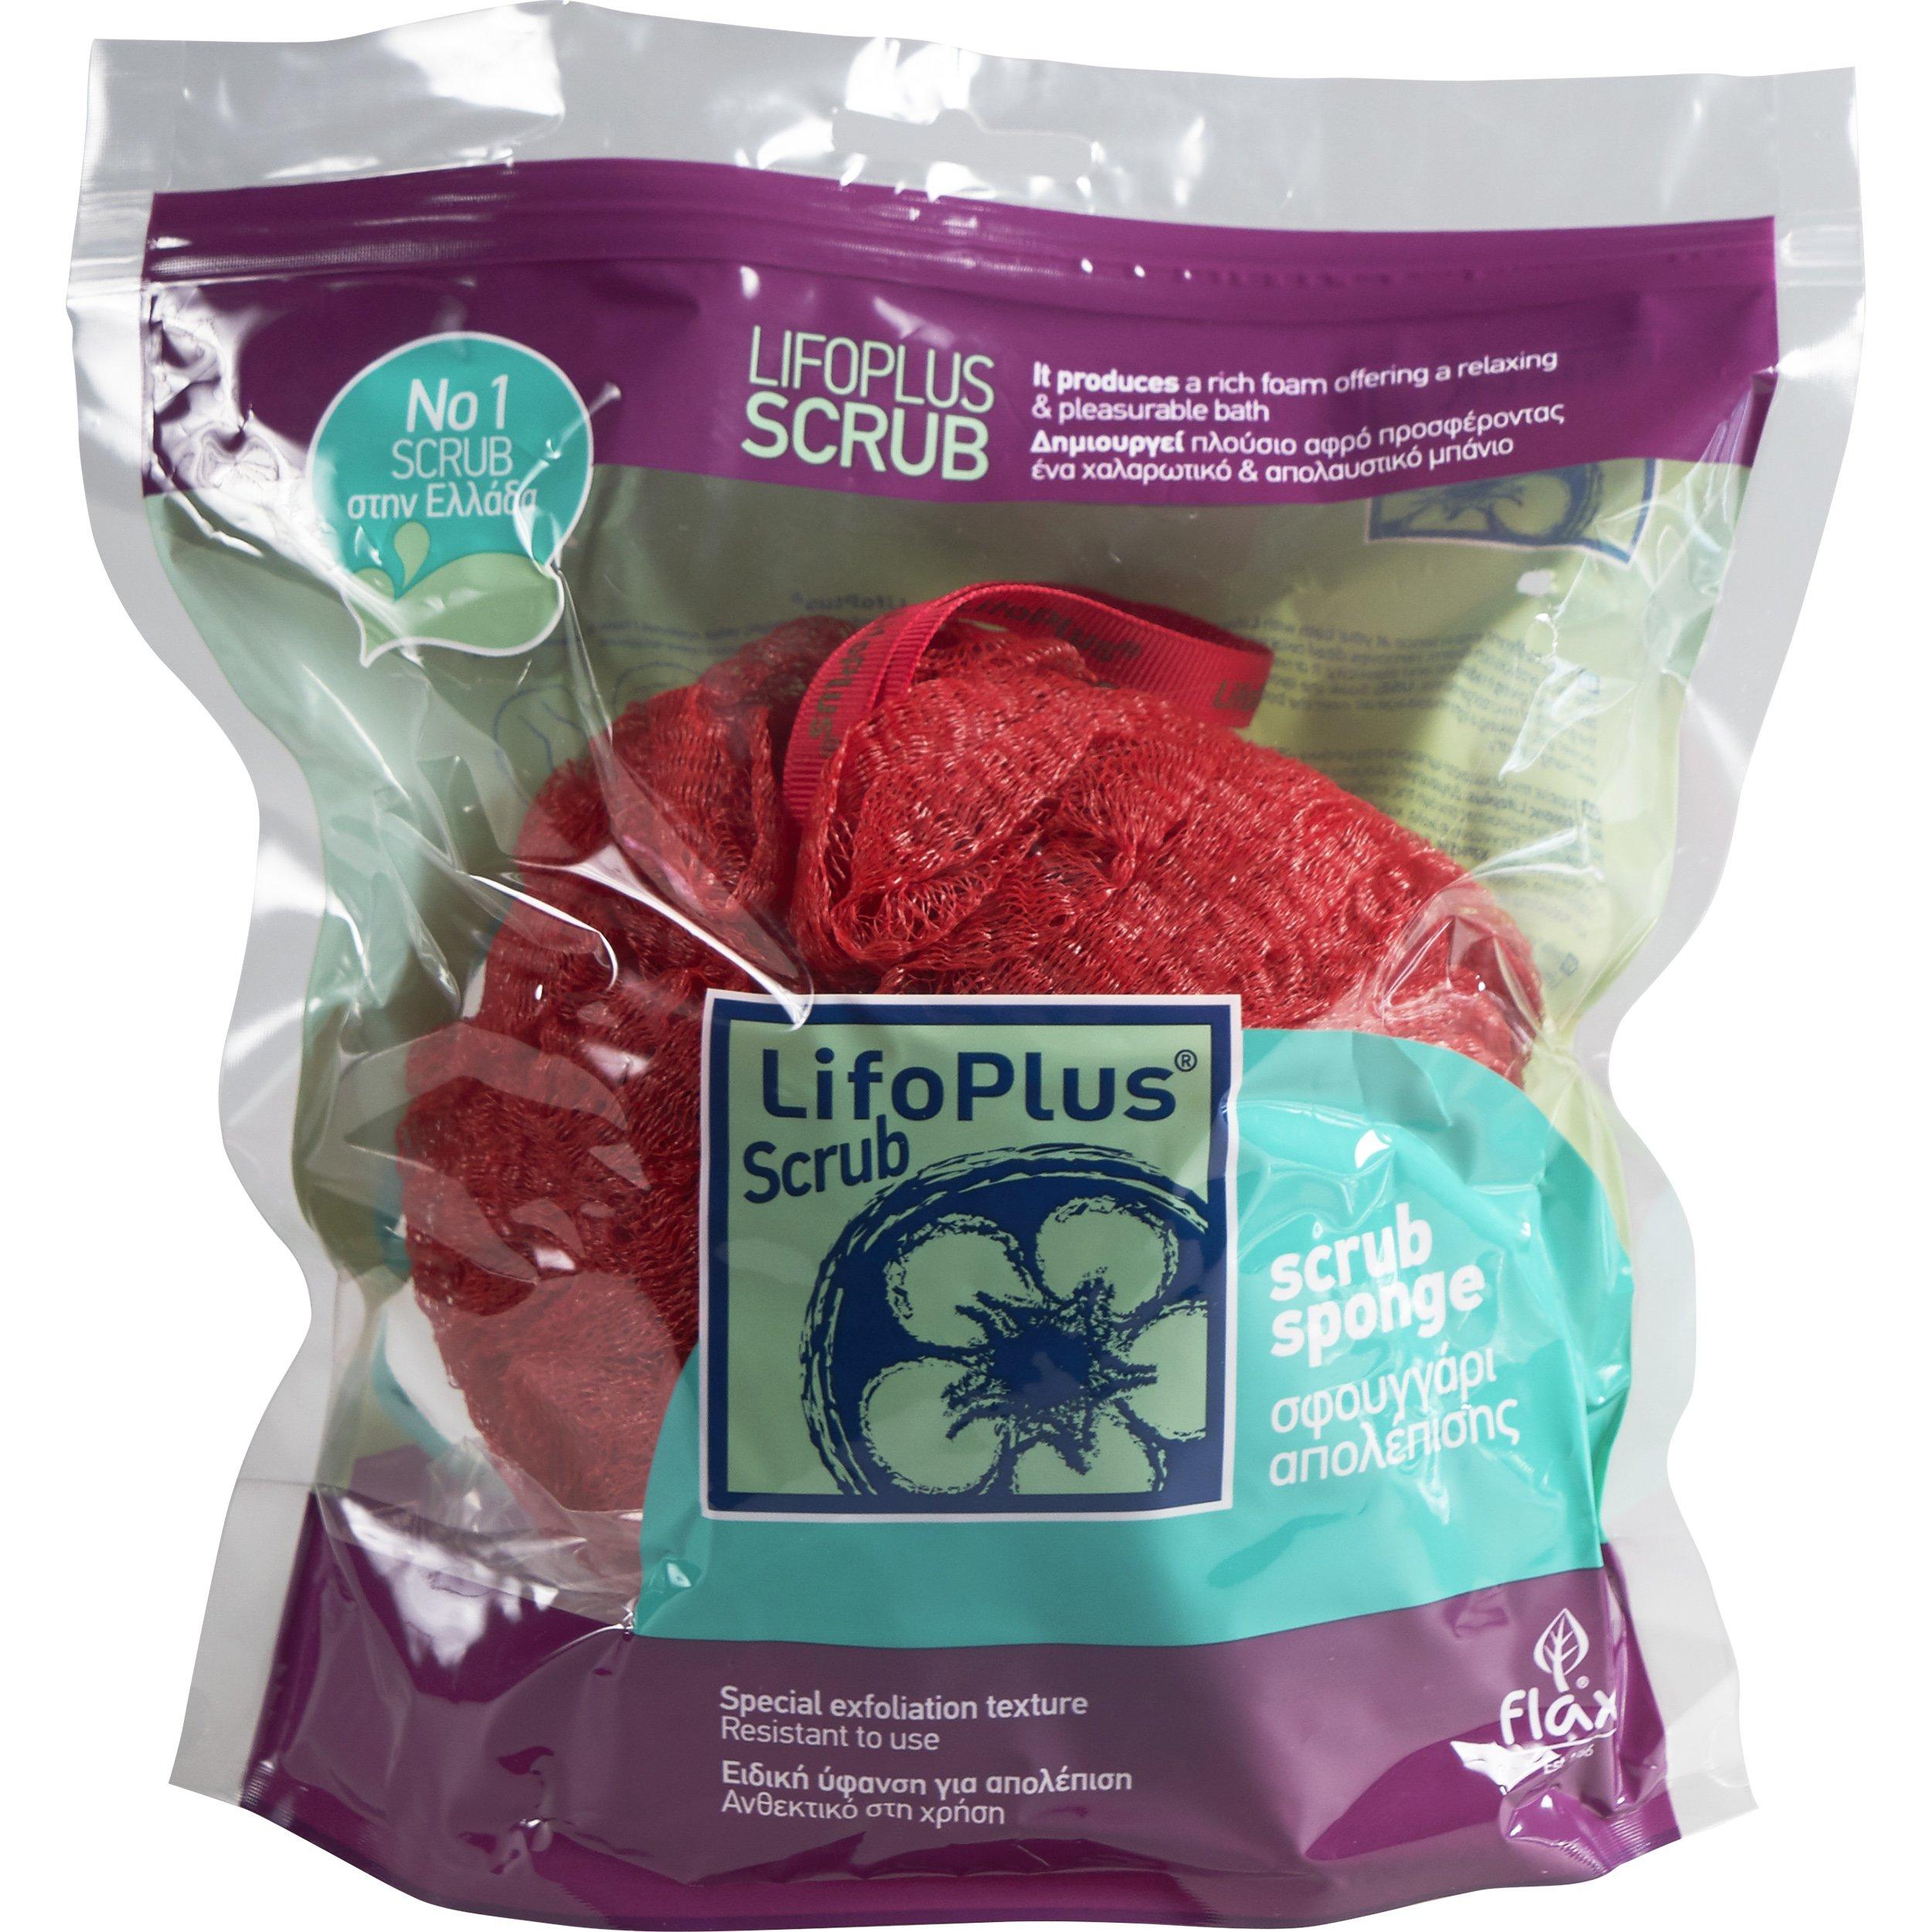 Lifoplus Scrub Σφουγγάρι Απολέπισης Κόκκινο 1 Τεμάχιο